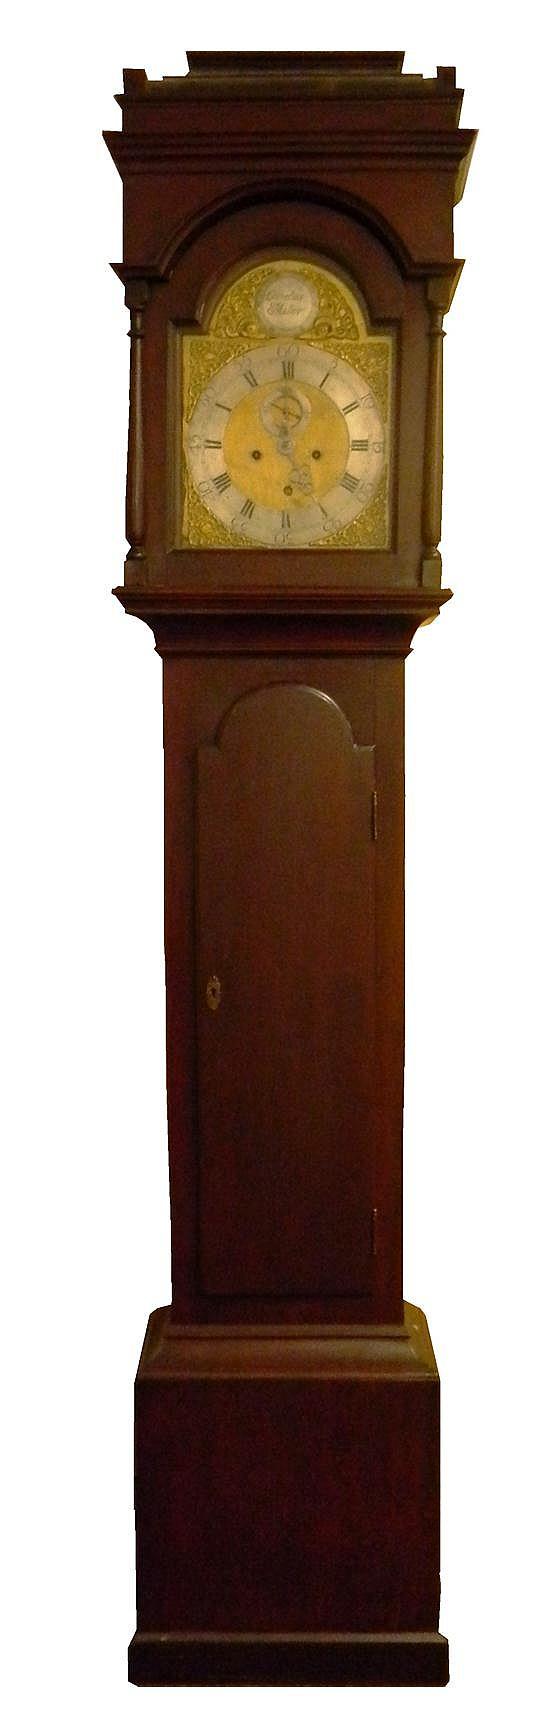 Cornelius Miller Tall Case Clock, circa 1770, walnut case, sarcophagus top intact, Queen Anne walnut case with tombstone door, finis...